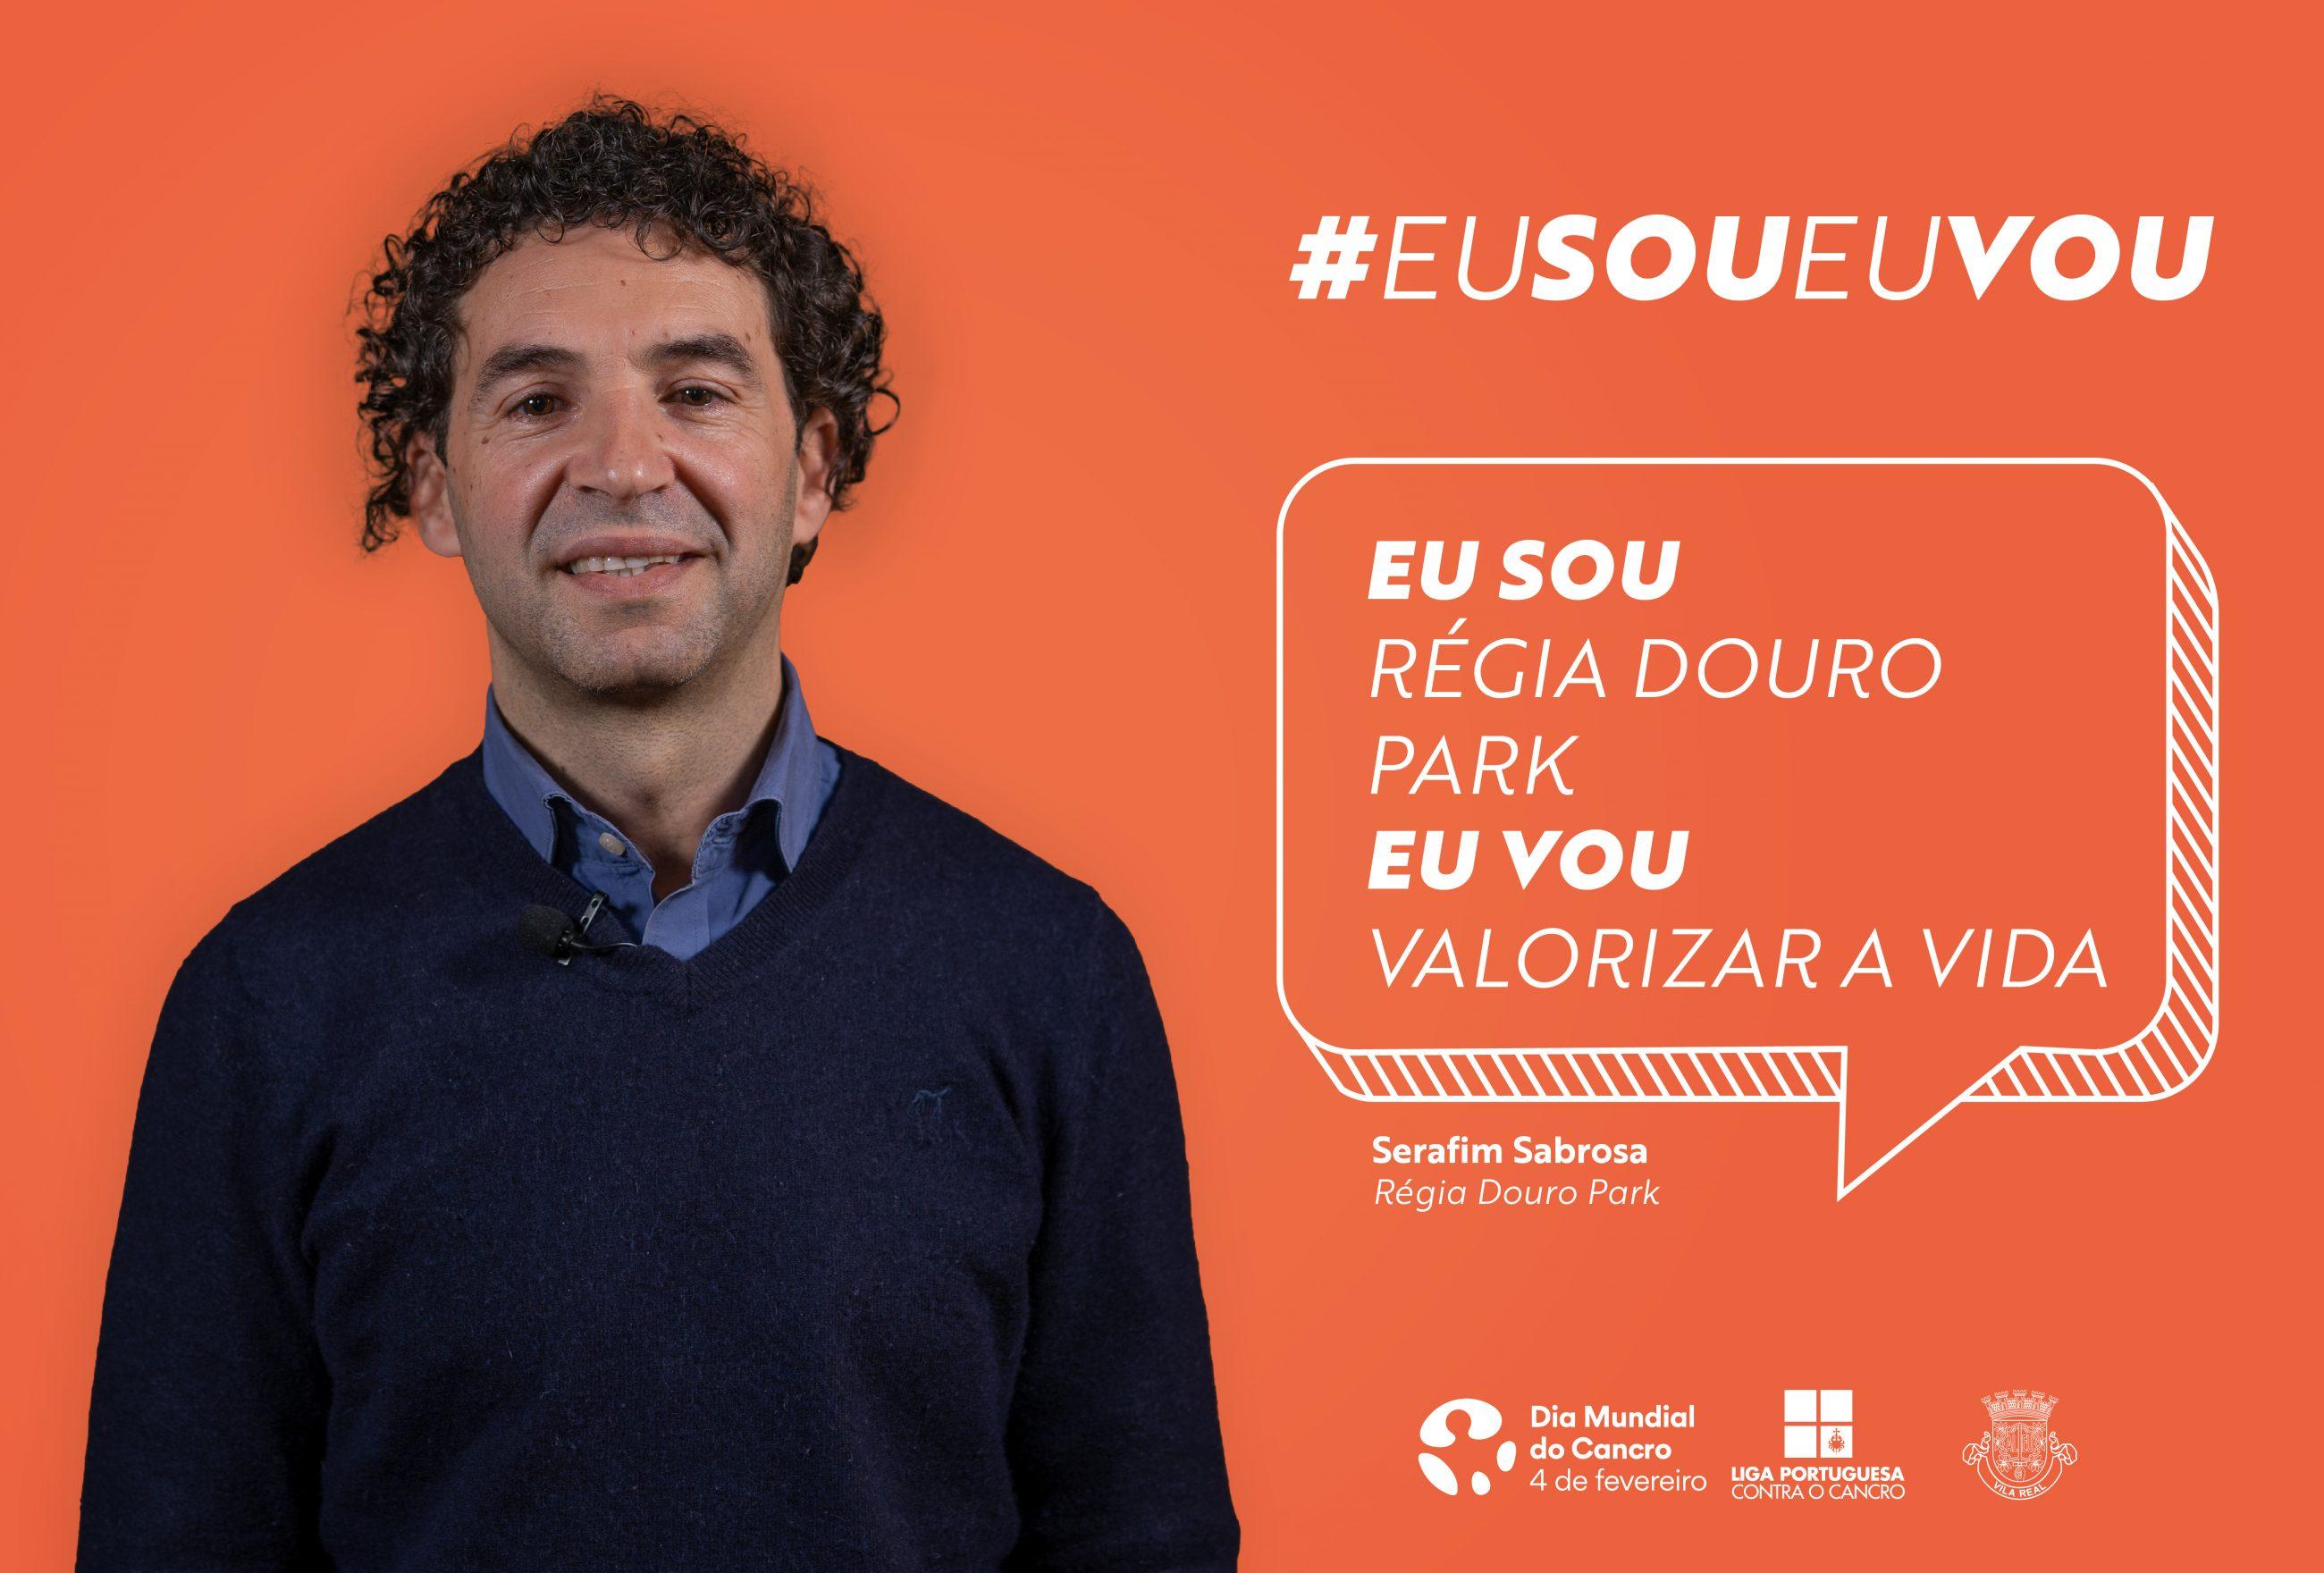 CMVR #EuSouEuVou Vila Real Dia do Cancro